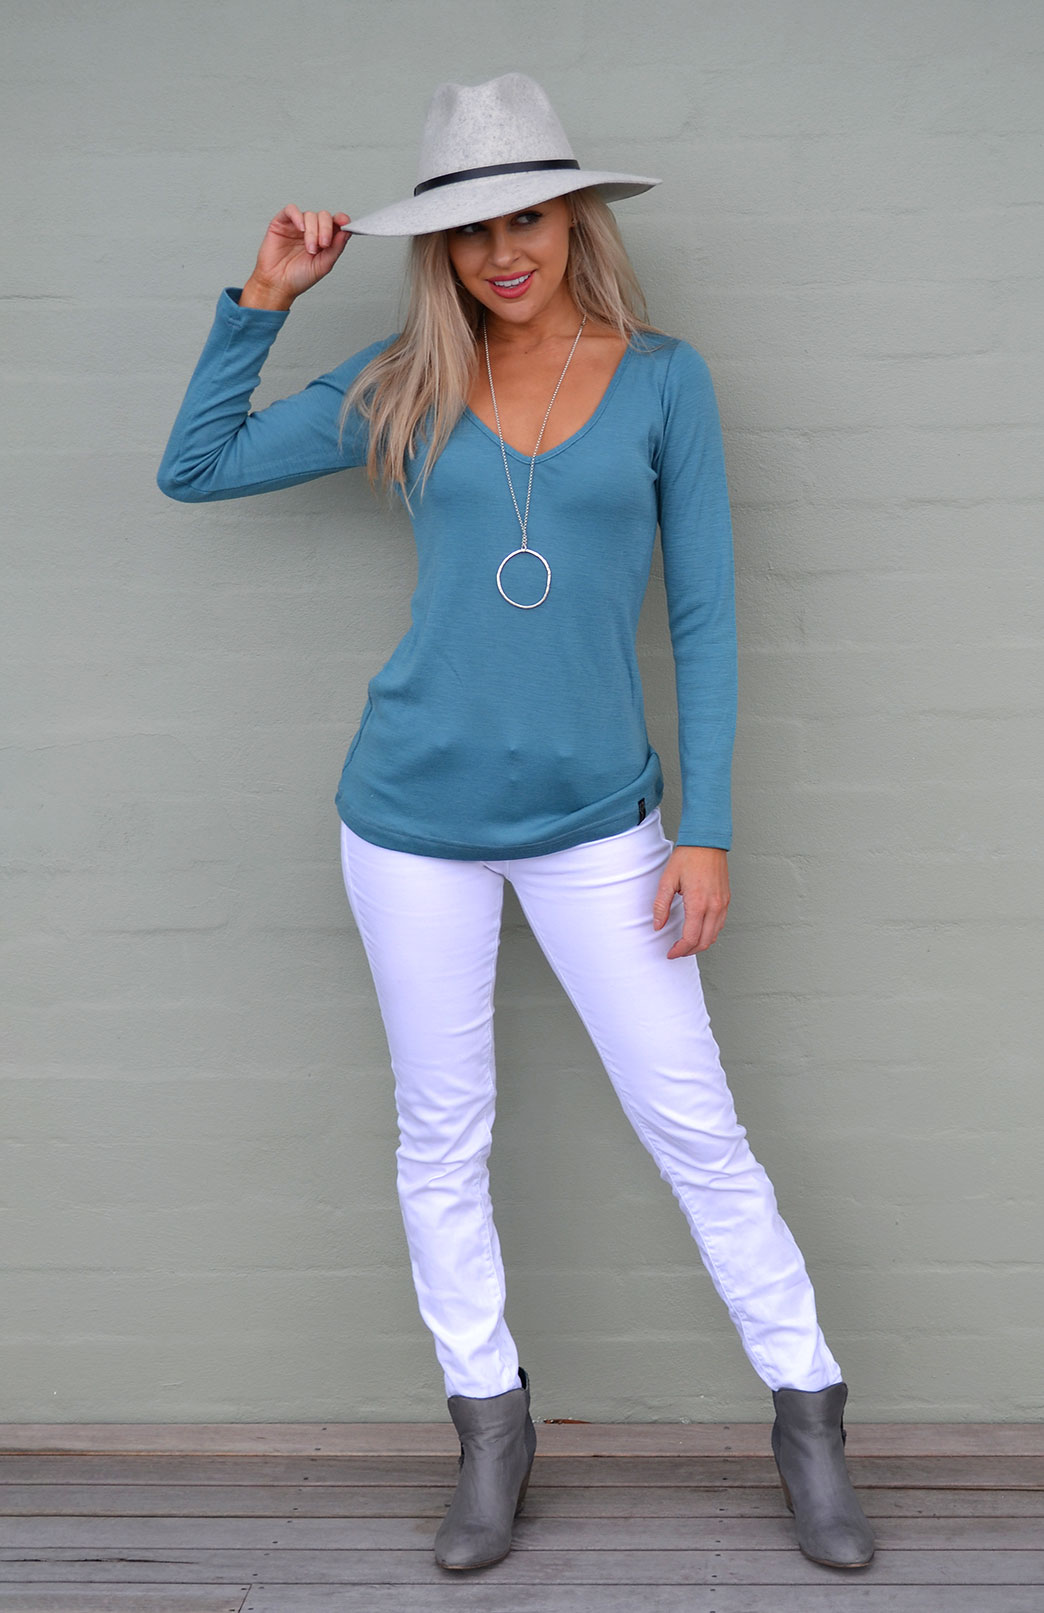 V-Neck Top - Women's Petrel V-Neck Long Sleeve Trans-Seasonal Wool Top - Smitten Merino Tasmania Australia